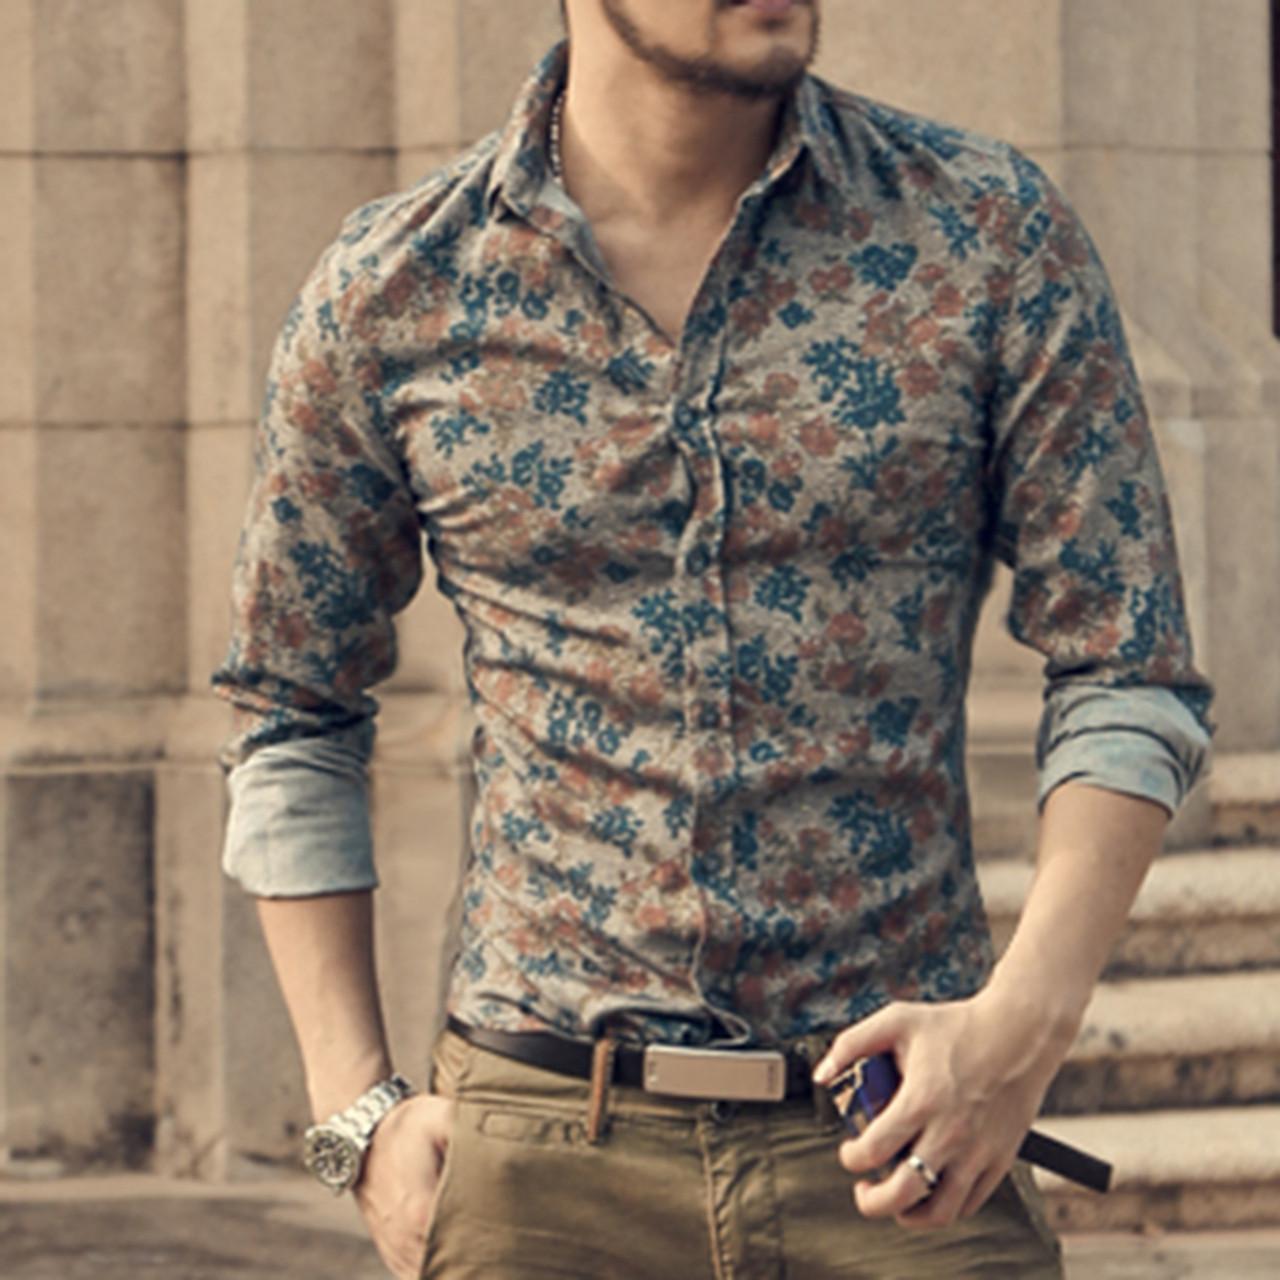 Fashion Men Casual Floral Shirts Formal Dress Shirts Long Sleeve Slim Fit Shirts